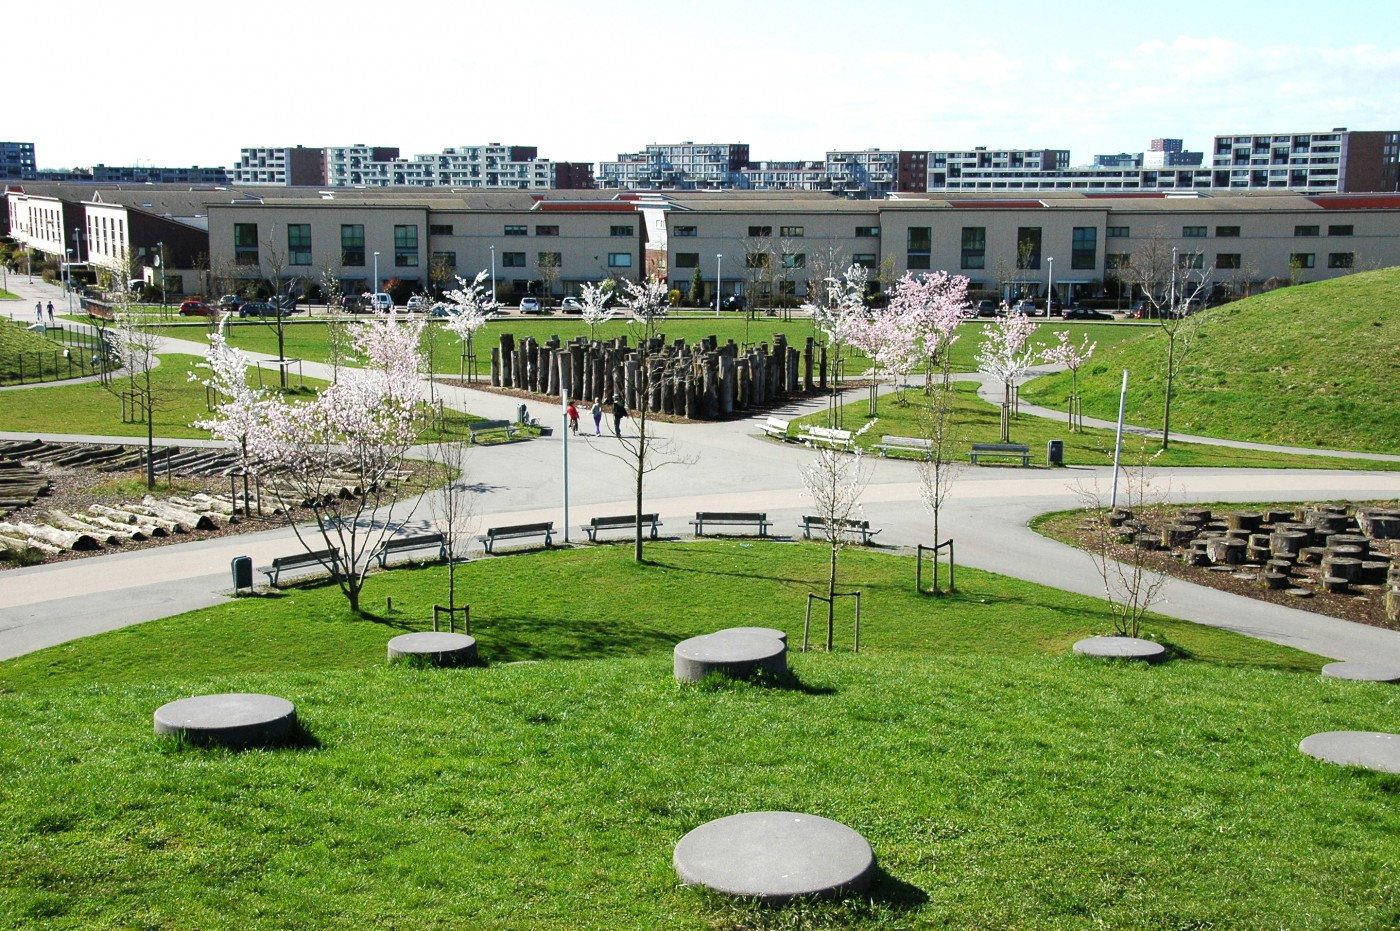 buro-sant-en-co-landschapsarchitectuur-park-de-hoge-weide-utrecht-buurtpark-leidsche-rijn-parkhart